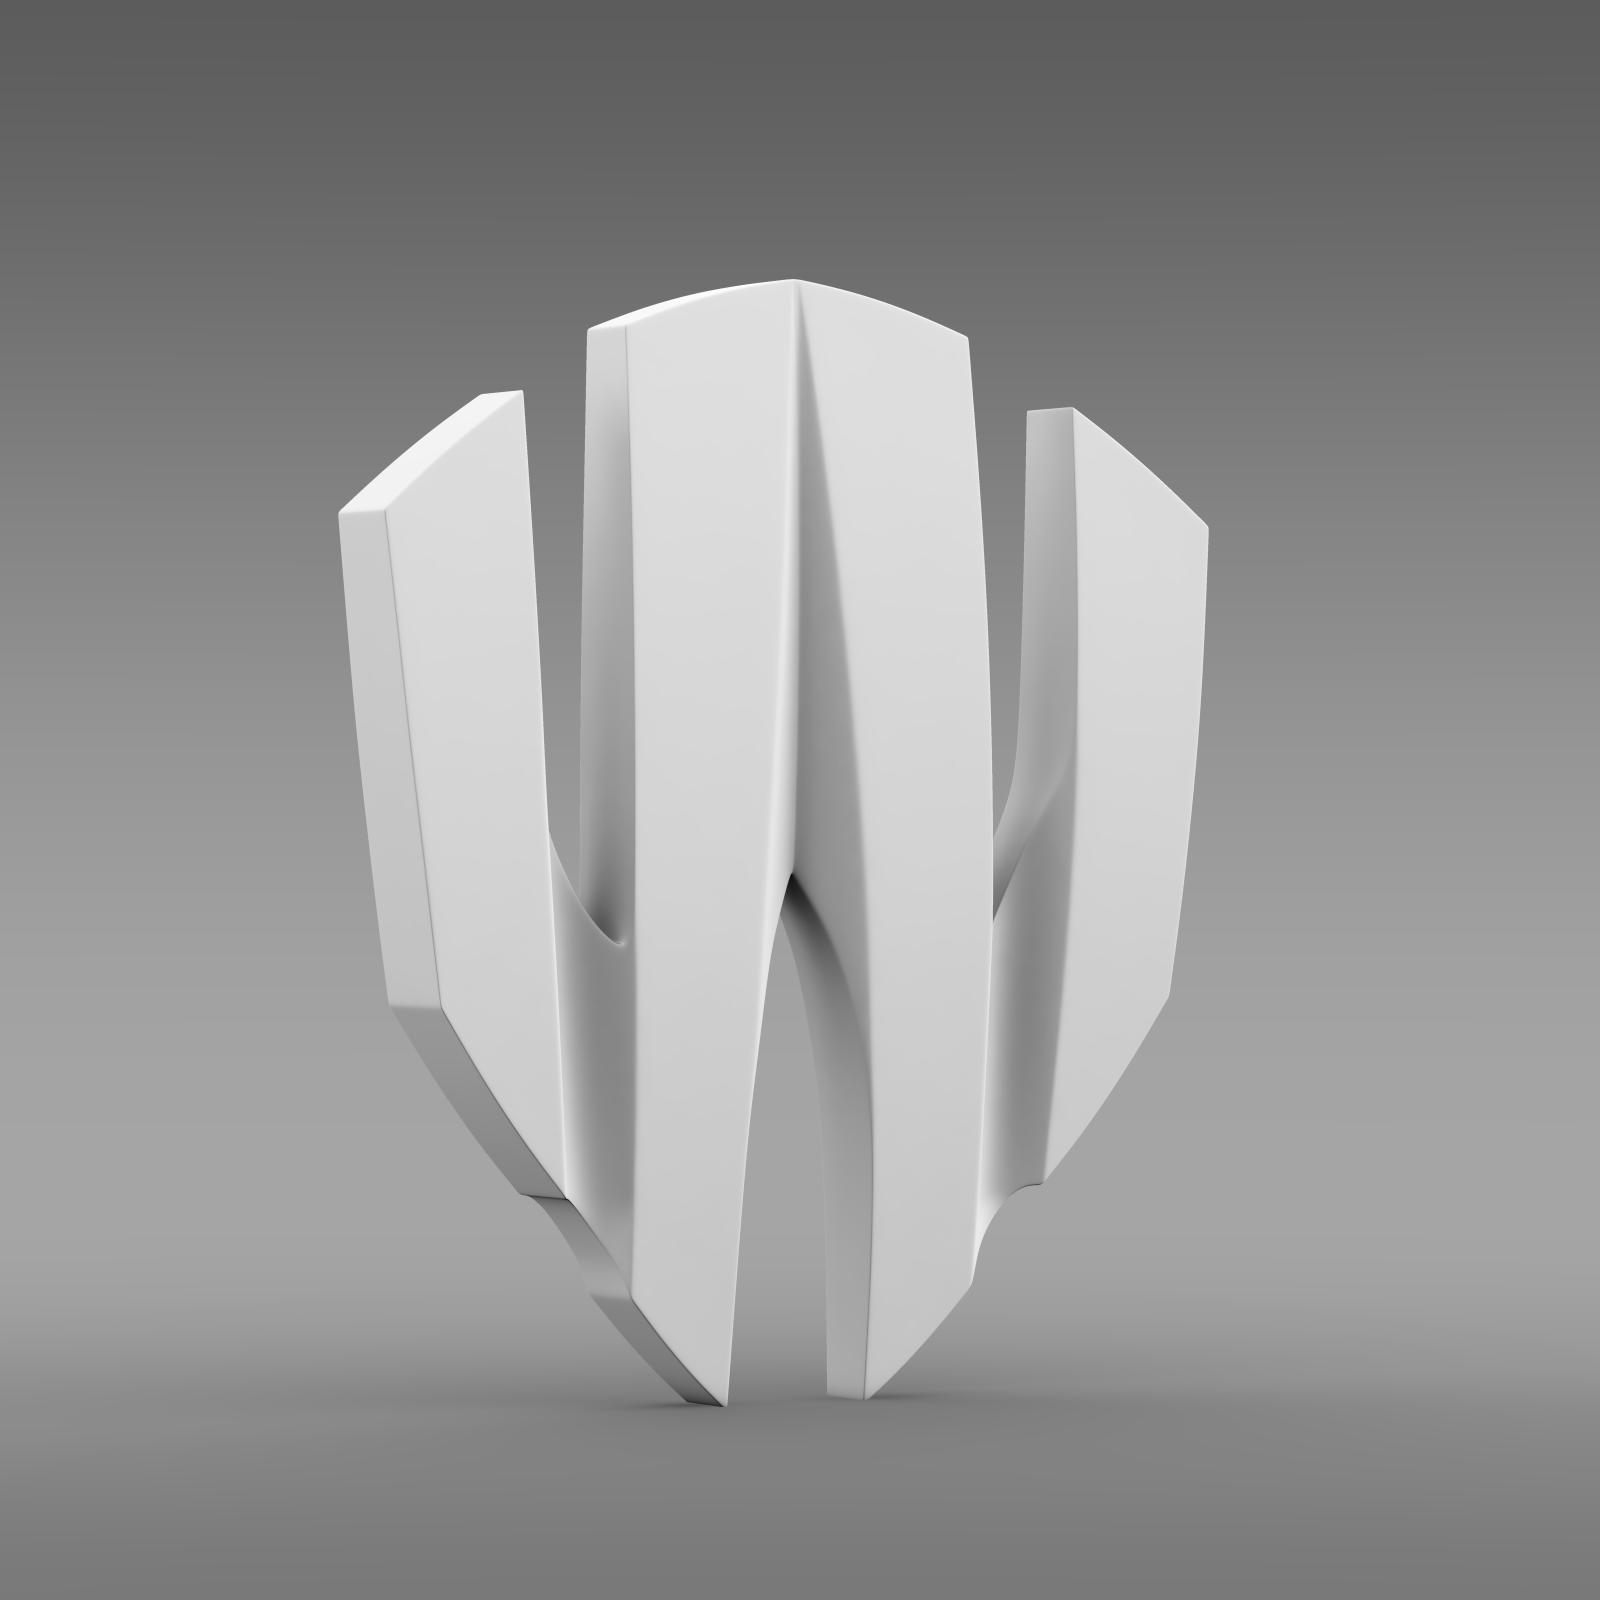 w motors lykan hypersport logo 3d model 3ds max fbx c4d lwo ma mb hrc xsi obj 213250